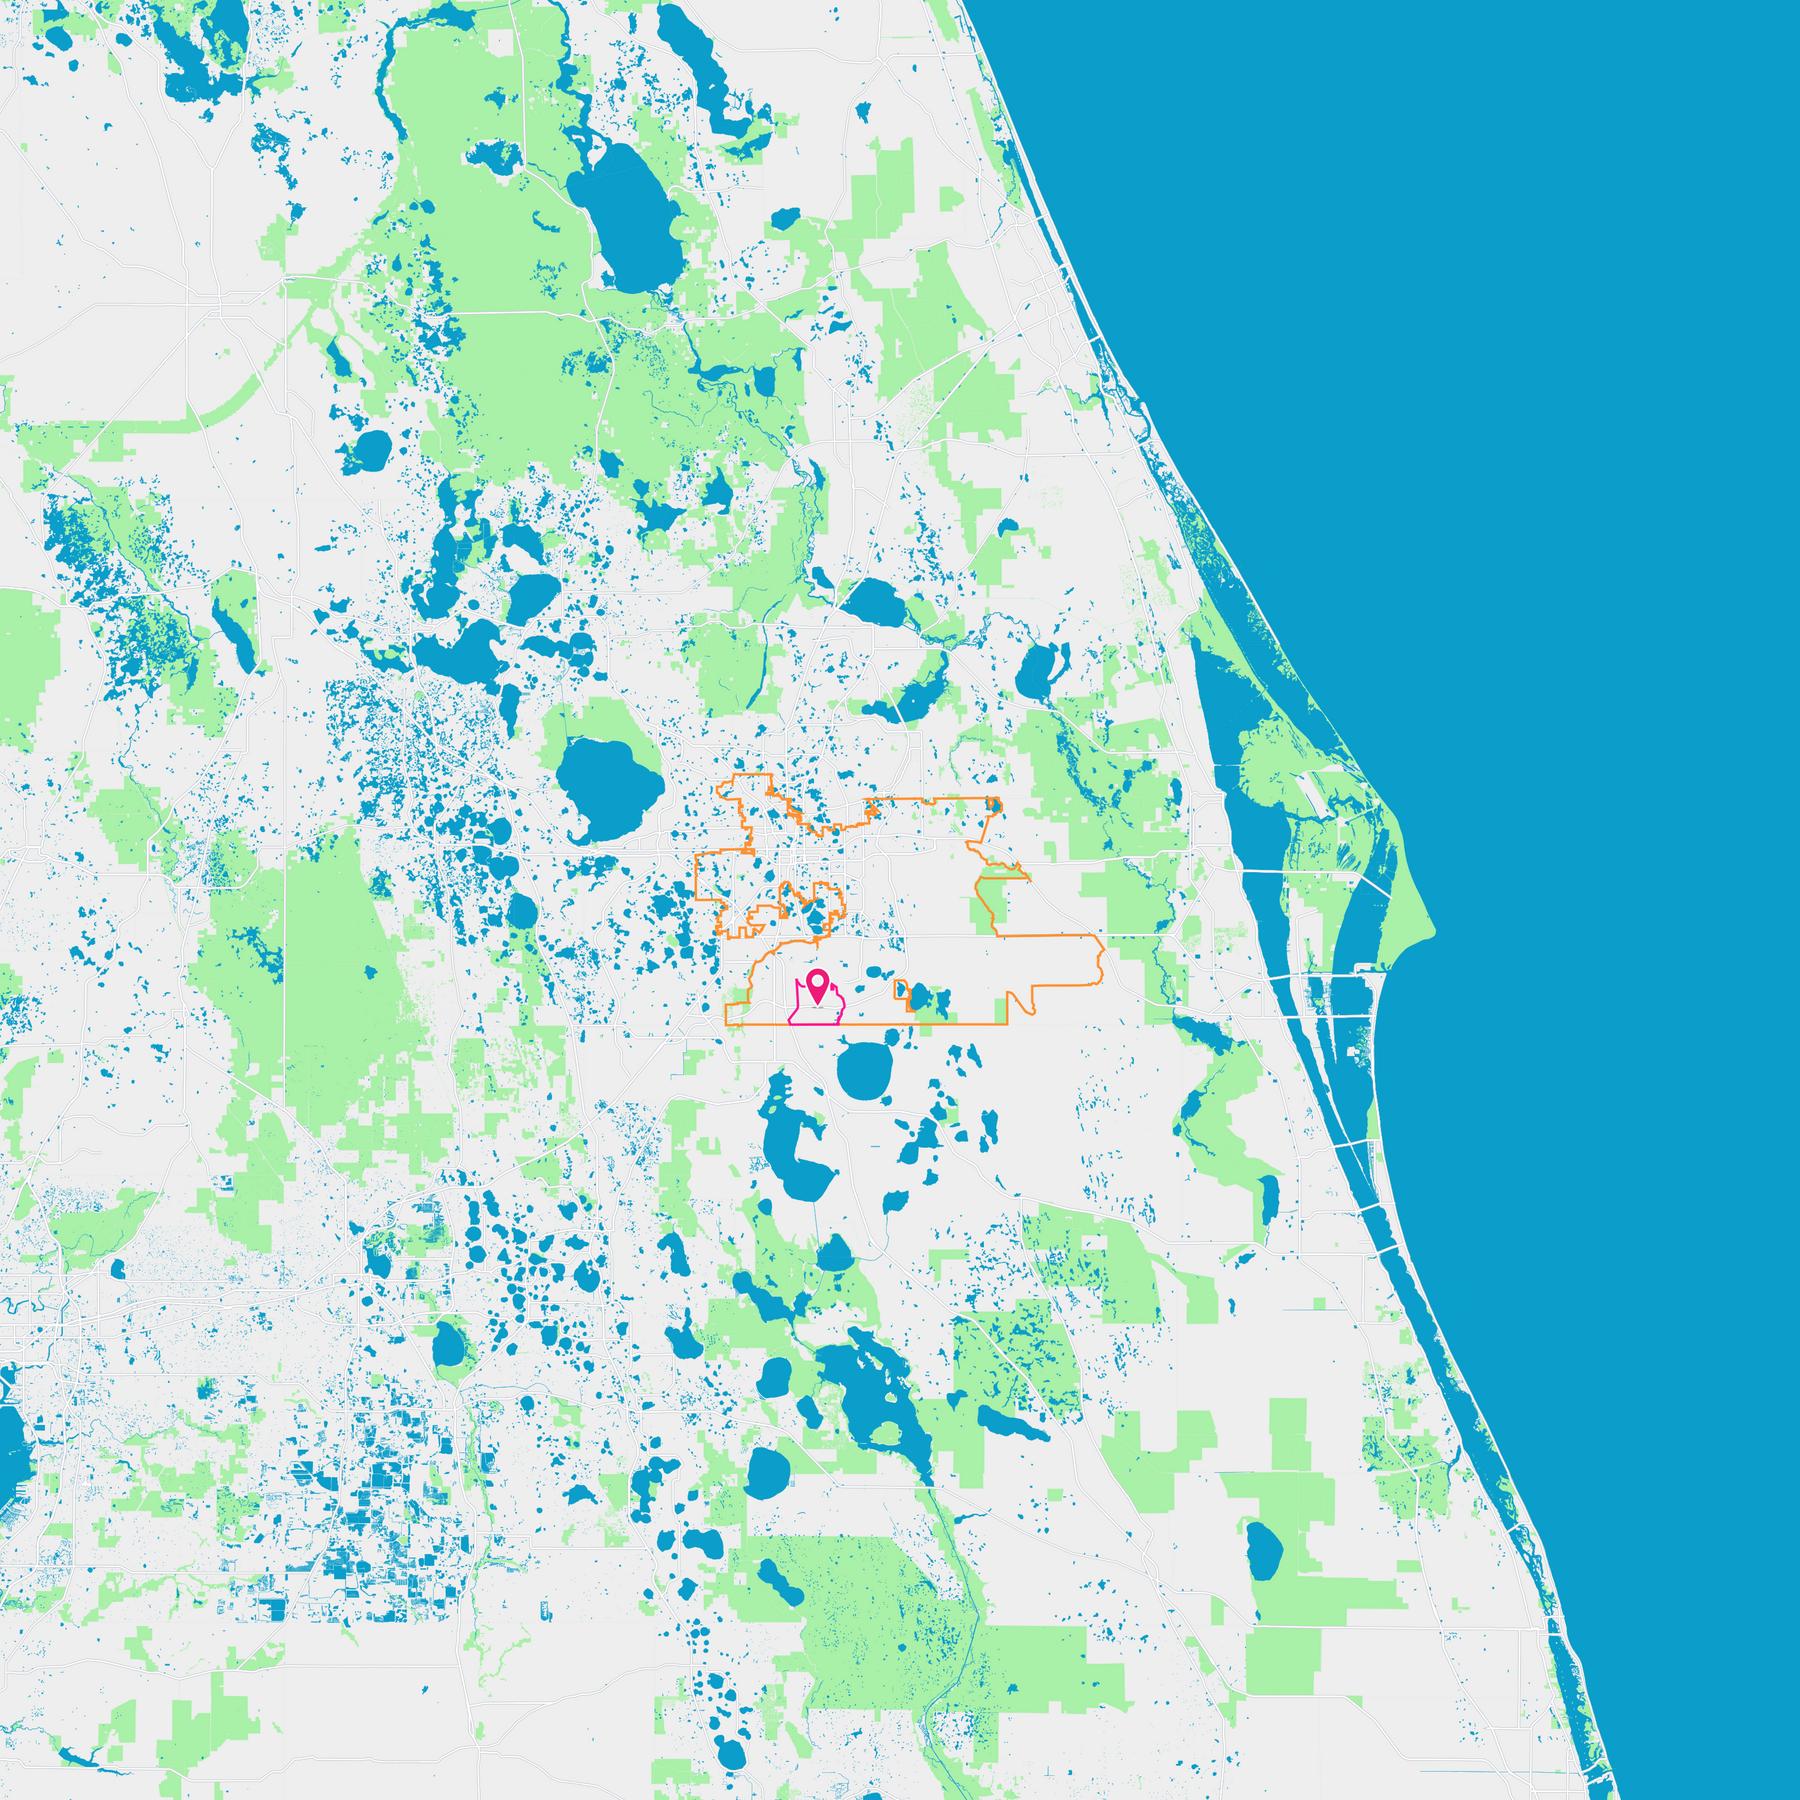 Meadow Wood Apartments: Meadow Woods Neighborhood Guide - Orlando, FL